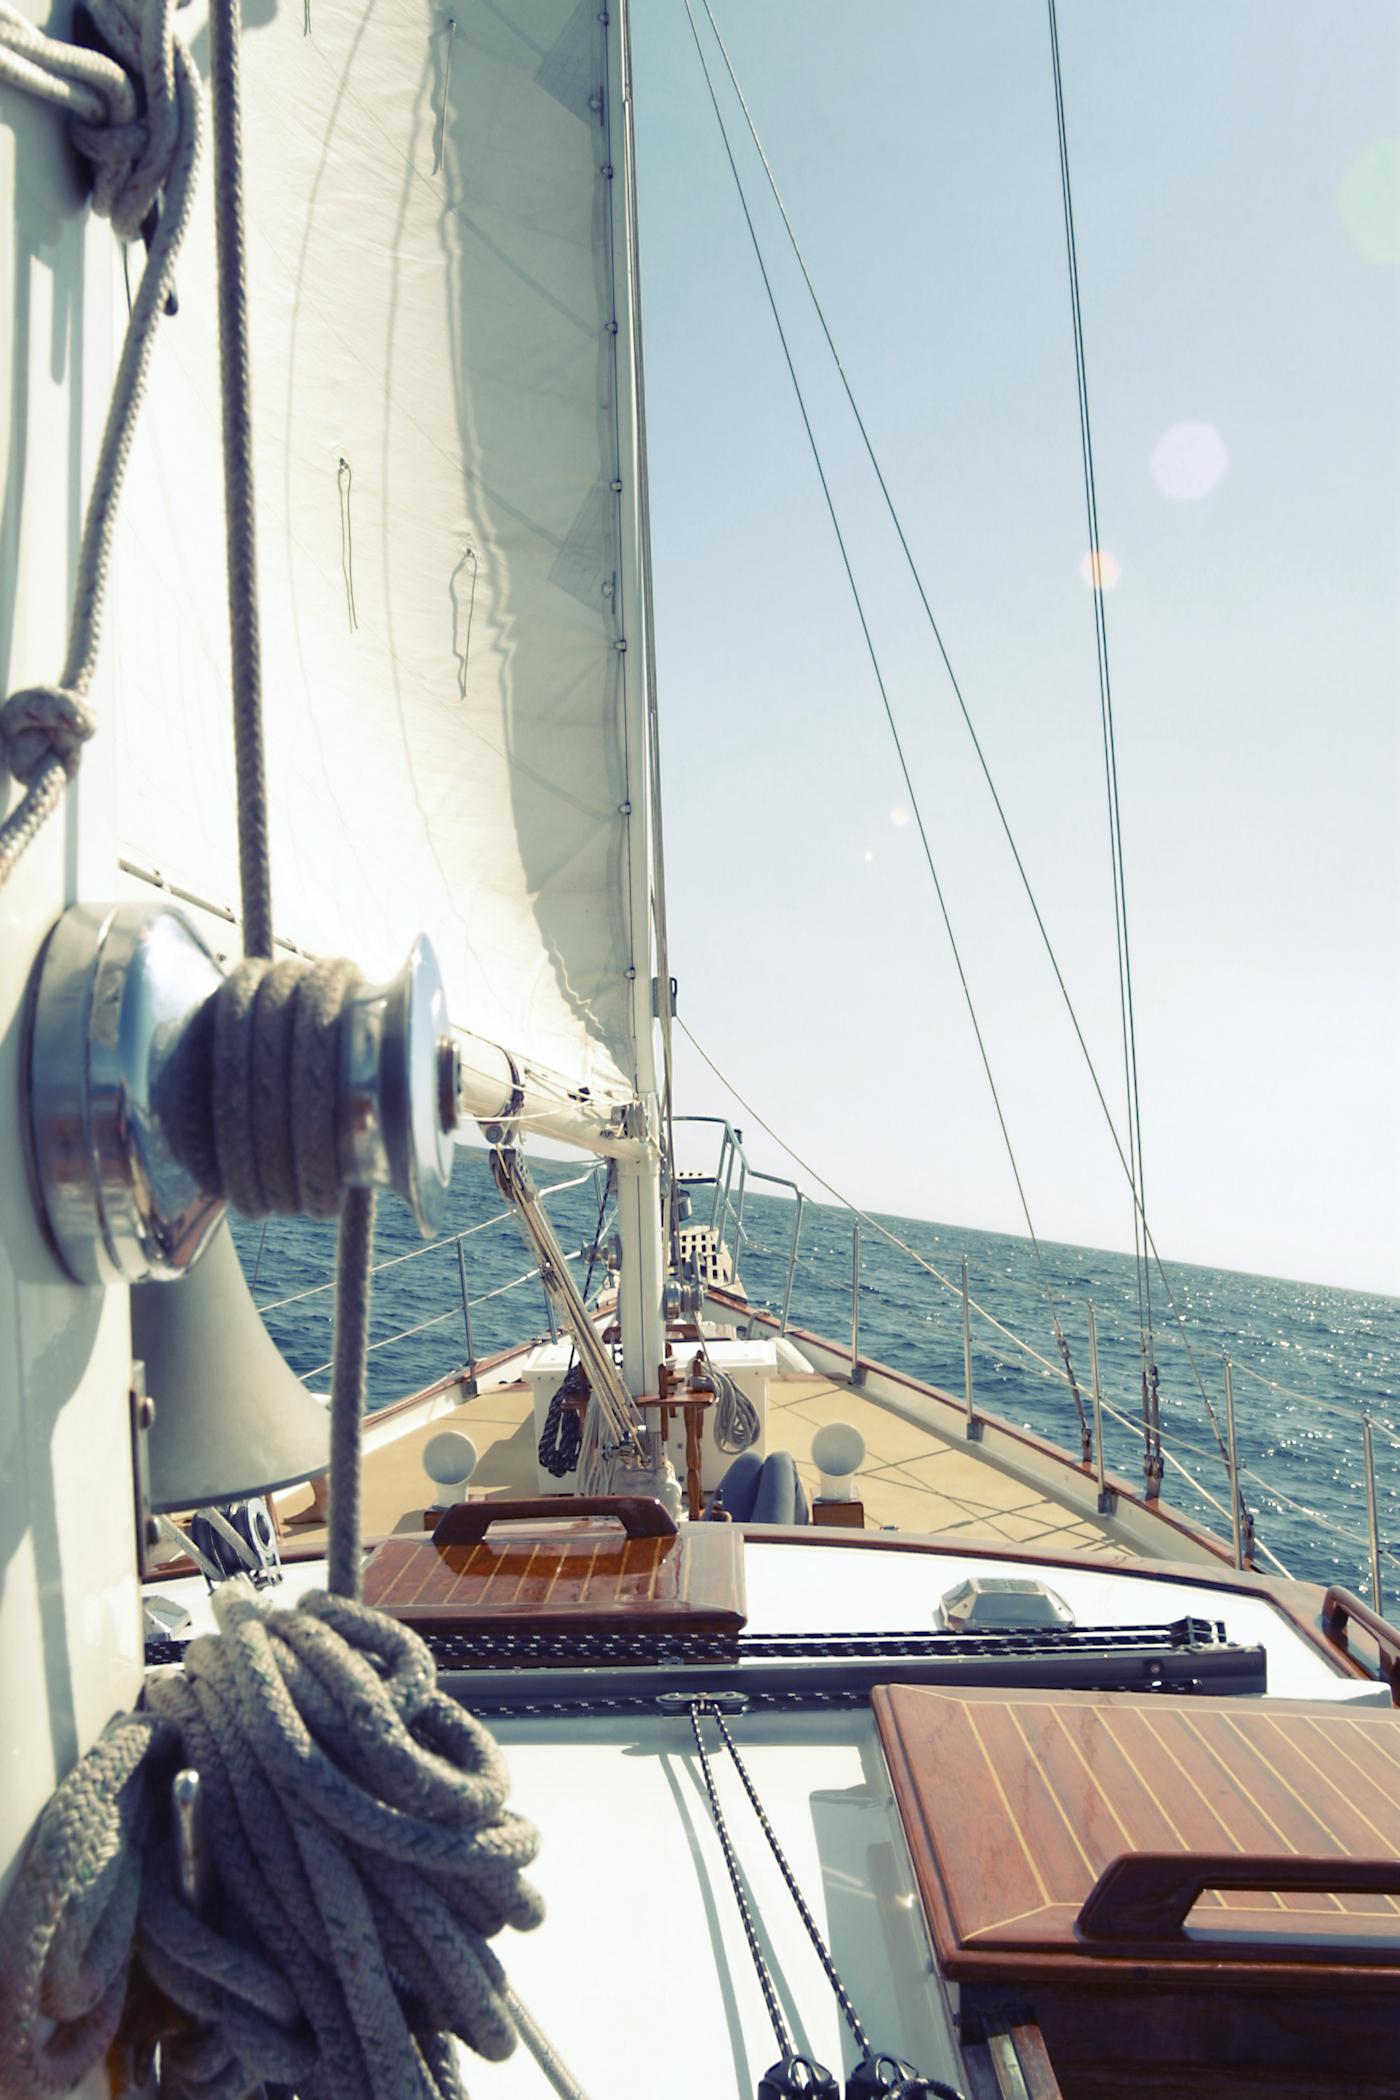 2014-05-Life-of-Pix-free-stock-photo-water-sail-boat2